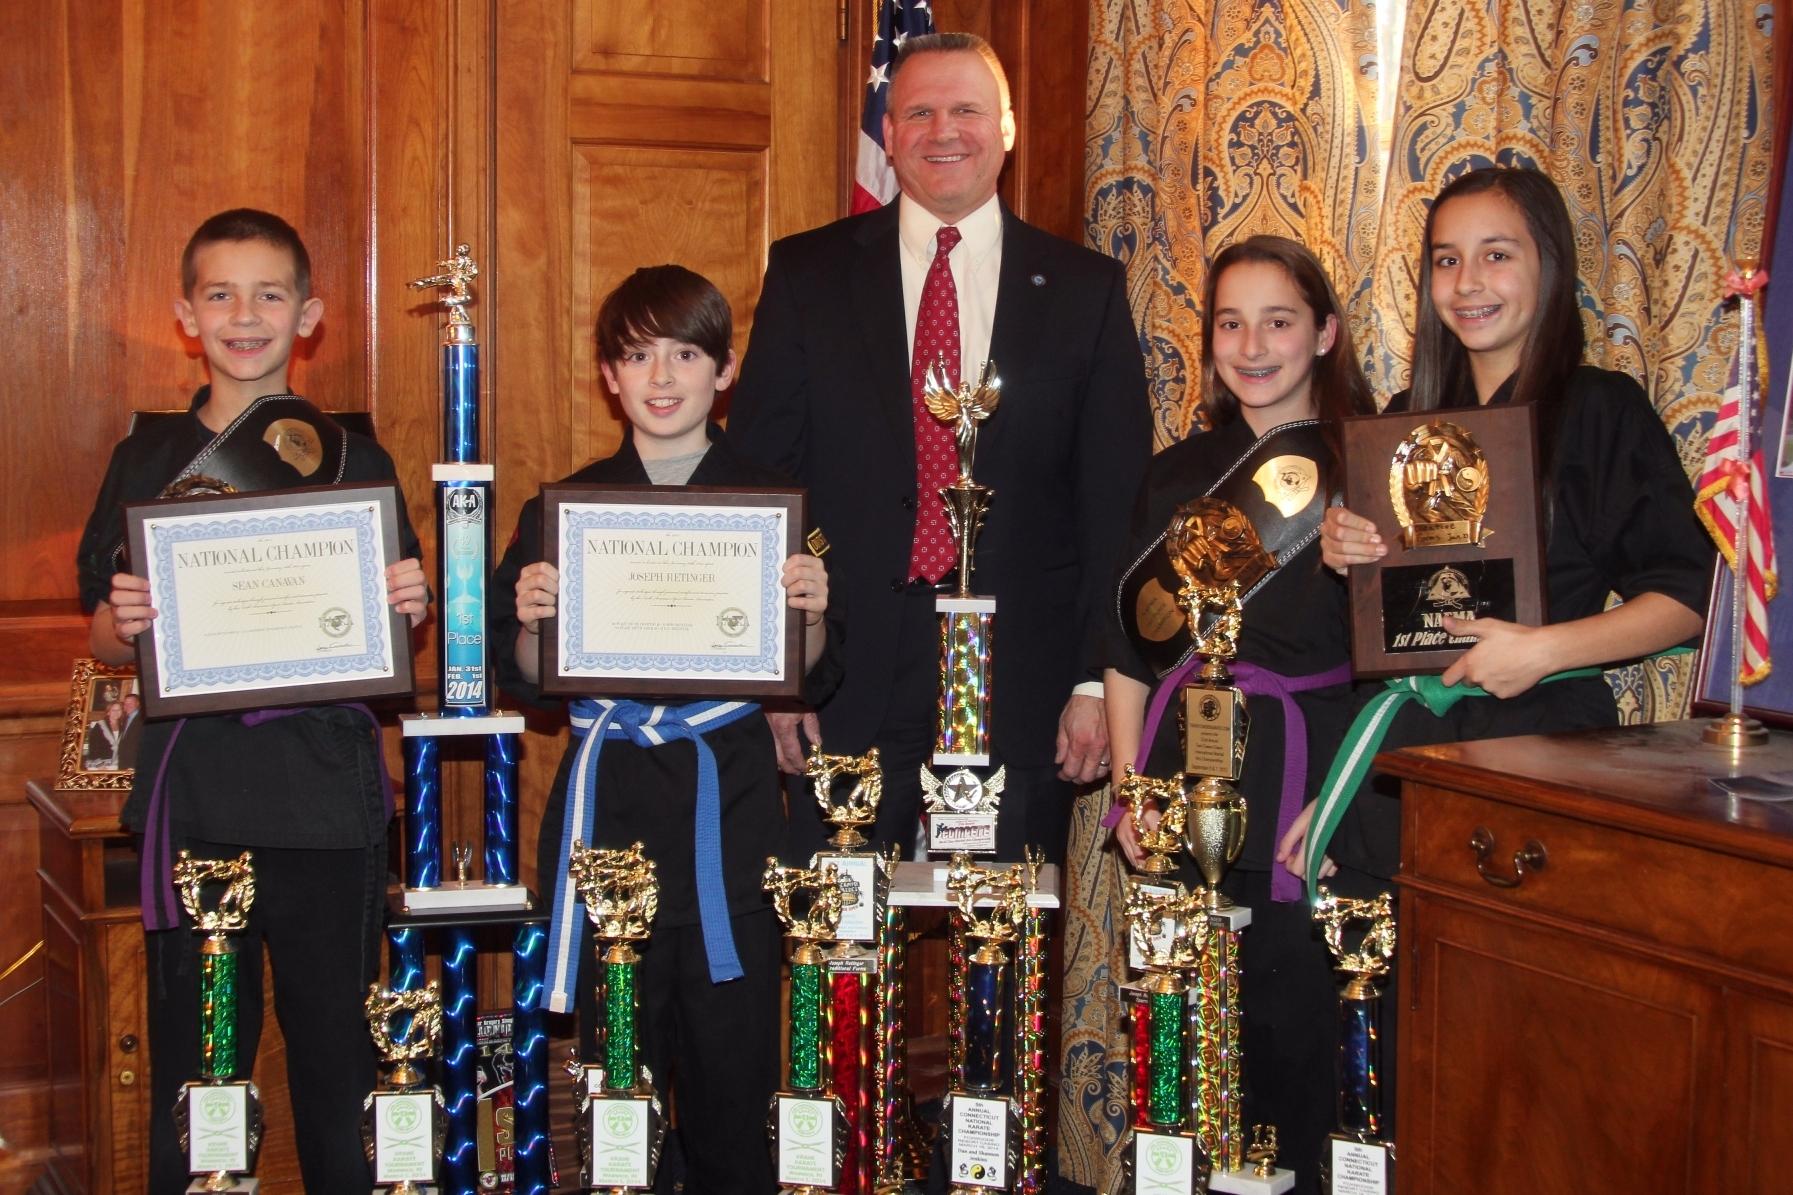 f5b292a7d0e7202bcca9_karate_kids_and_mayor_March_18_2014.jpg